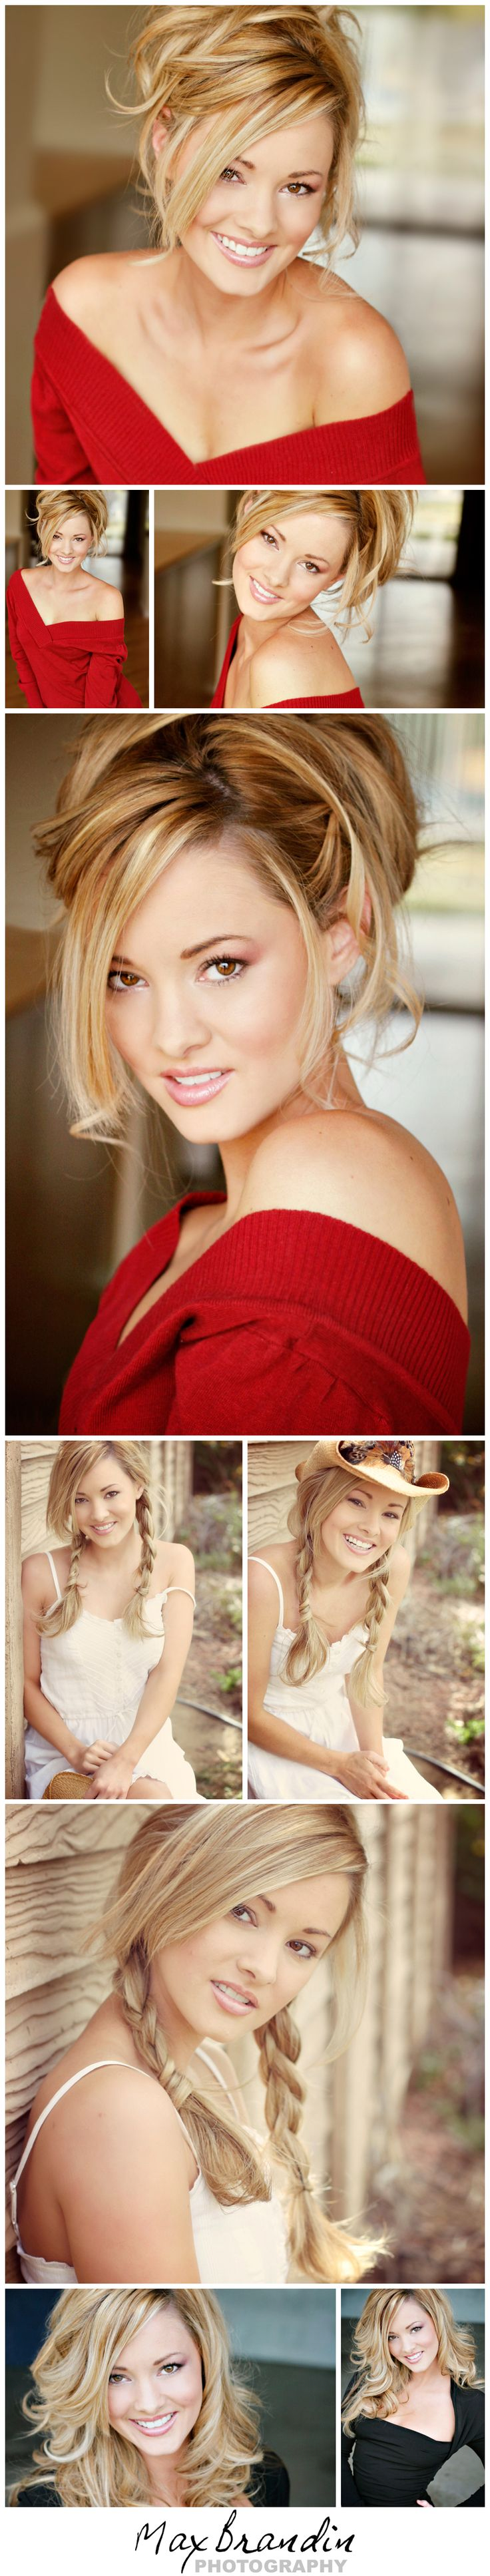 Max Brandin Photography | LA Actor Headshot Photographers in Southern CA